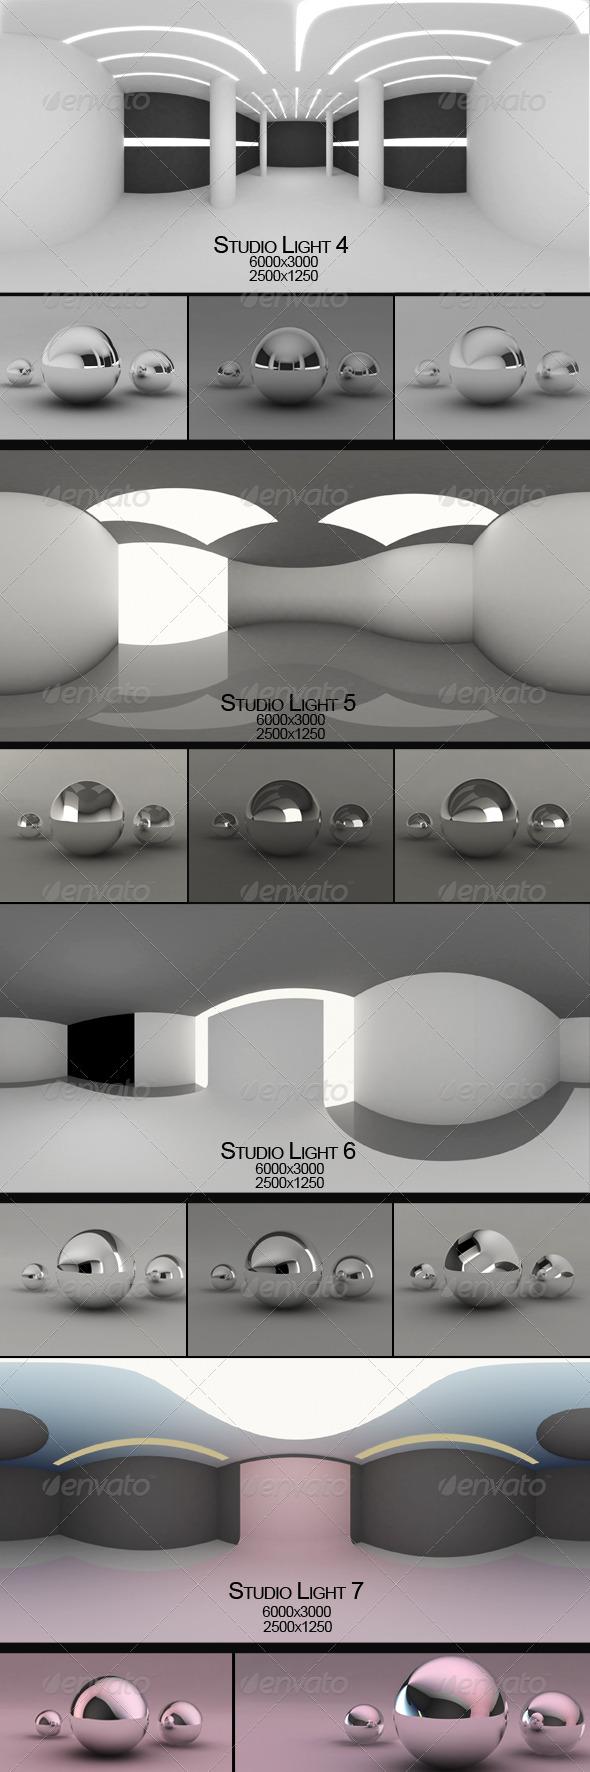 Studio light - 1